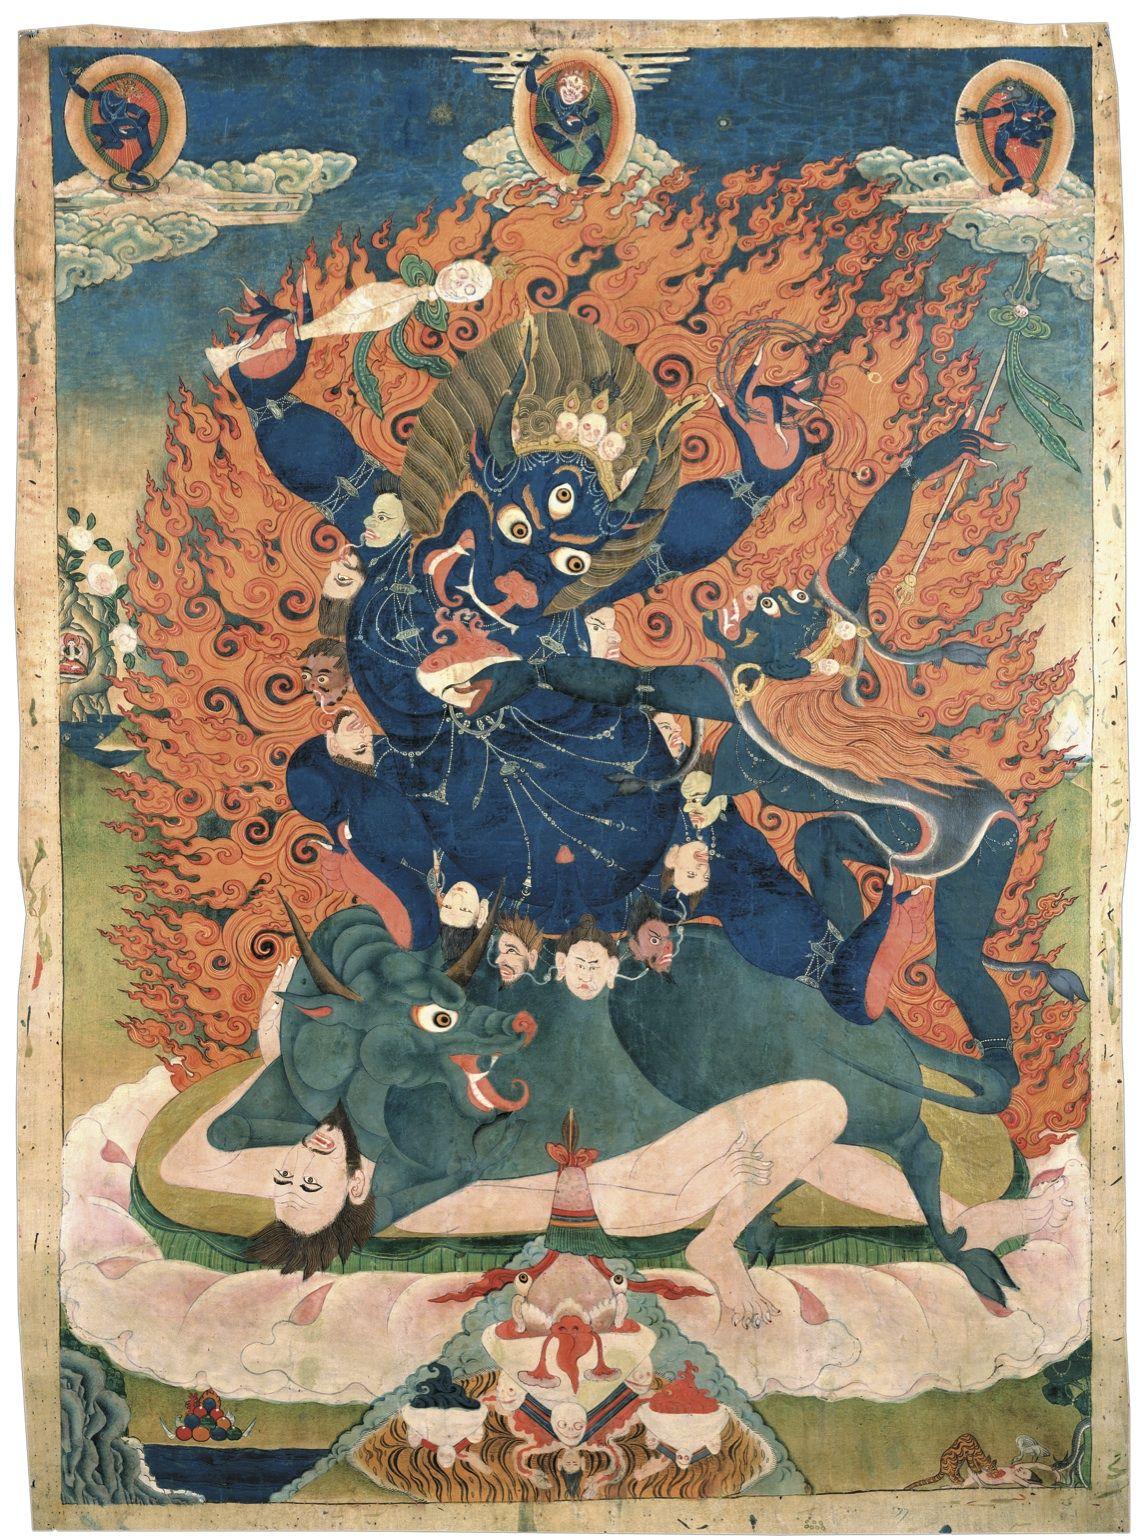 яма индуизм картинки круглой кокетки